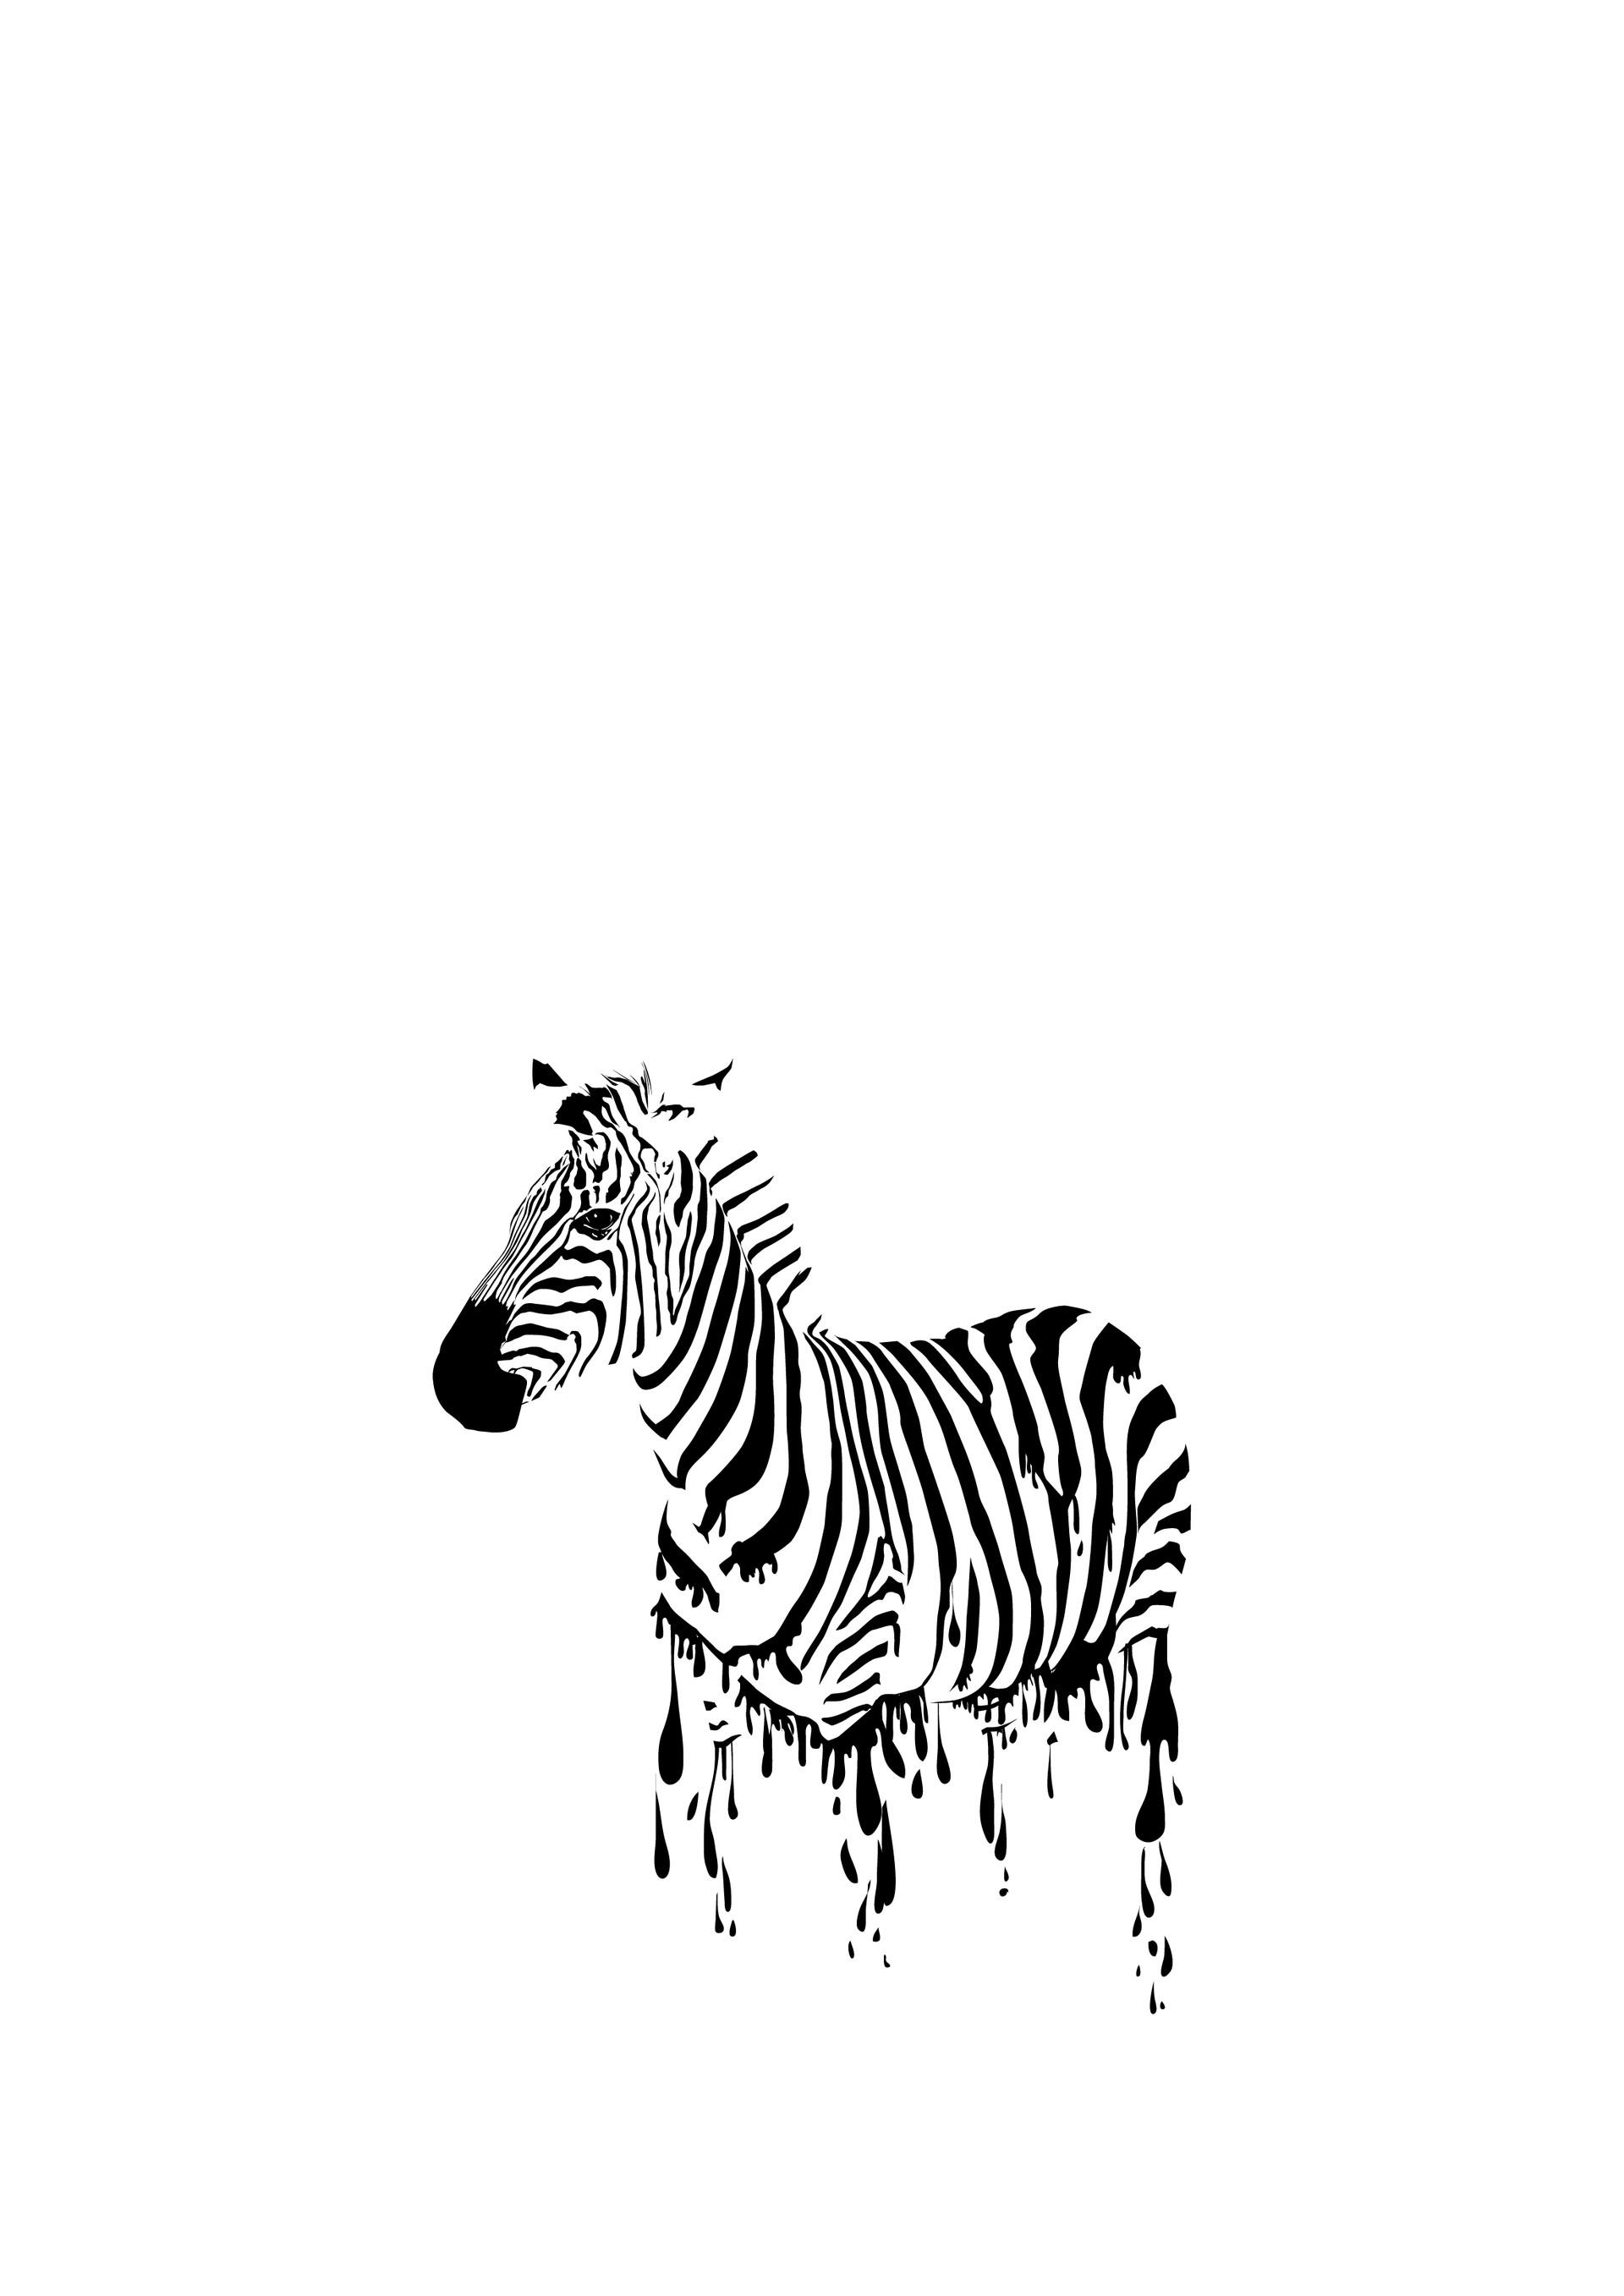 Rajesh sawant zebra global warming 02